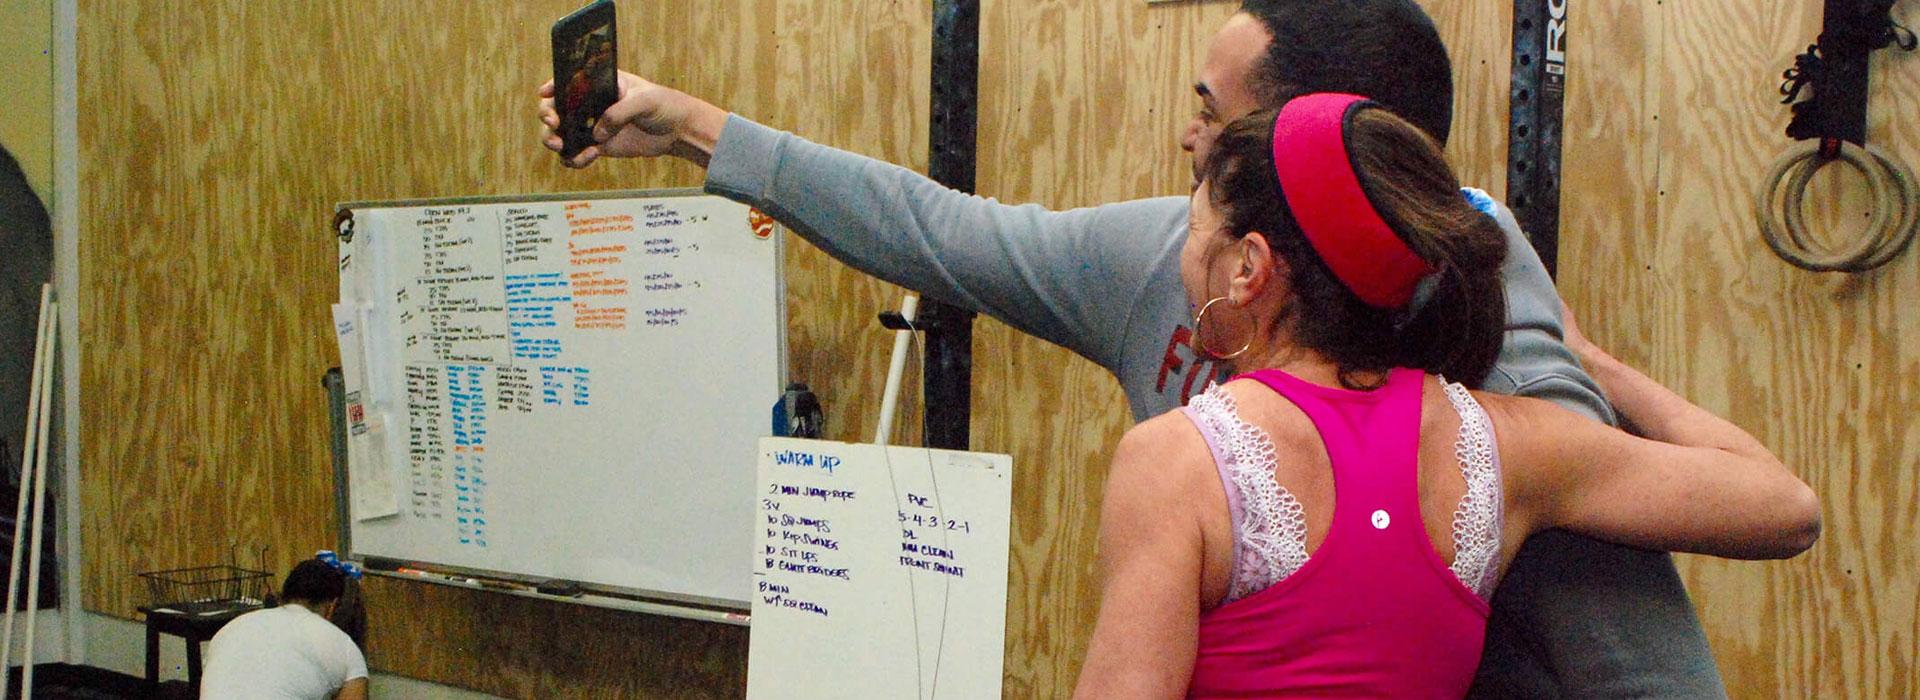 Workout in Cortlandt Manor NY, Workout near Yorktown Heights NY, Workout near Peekskill NY